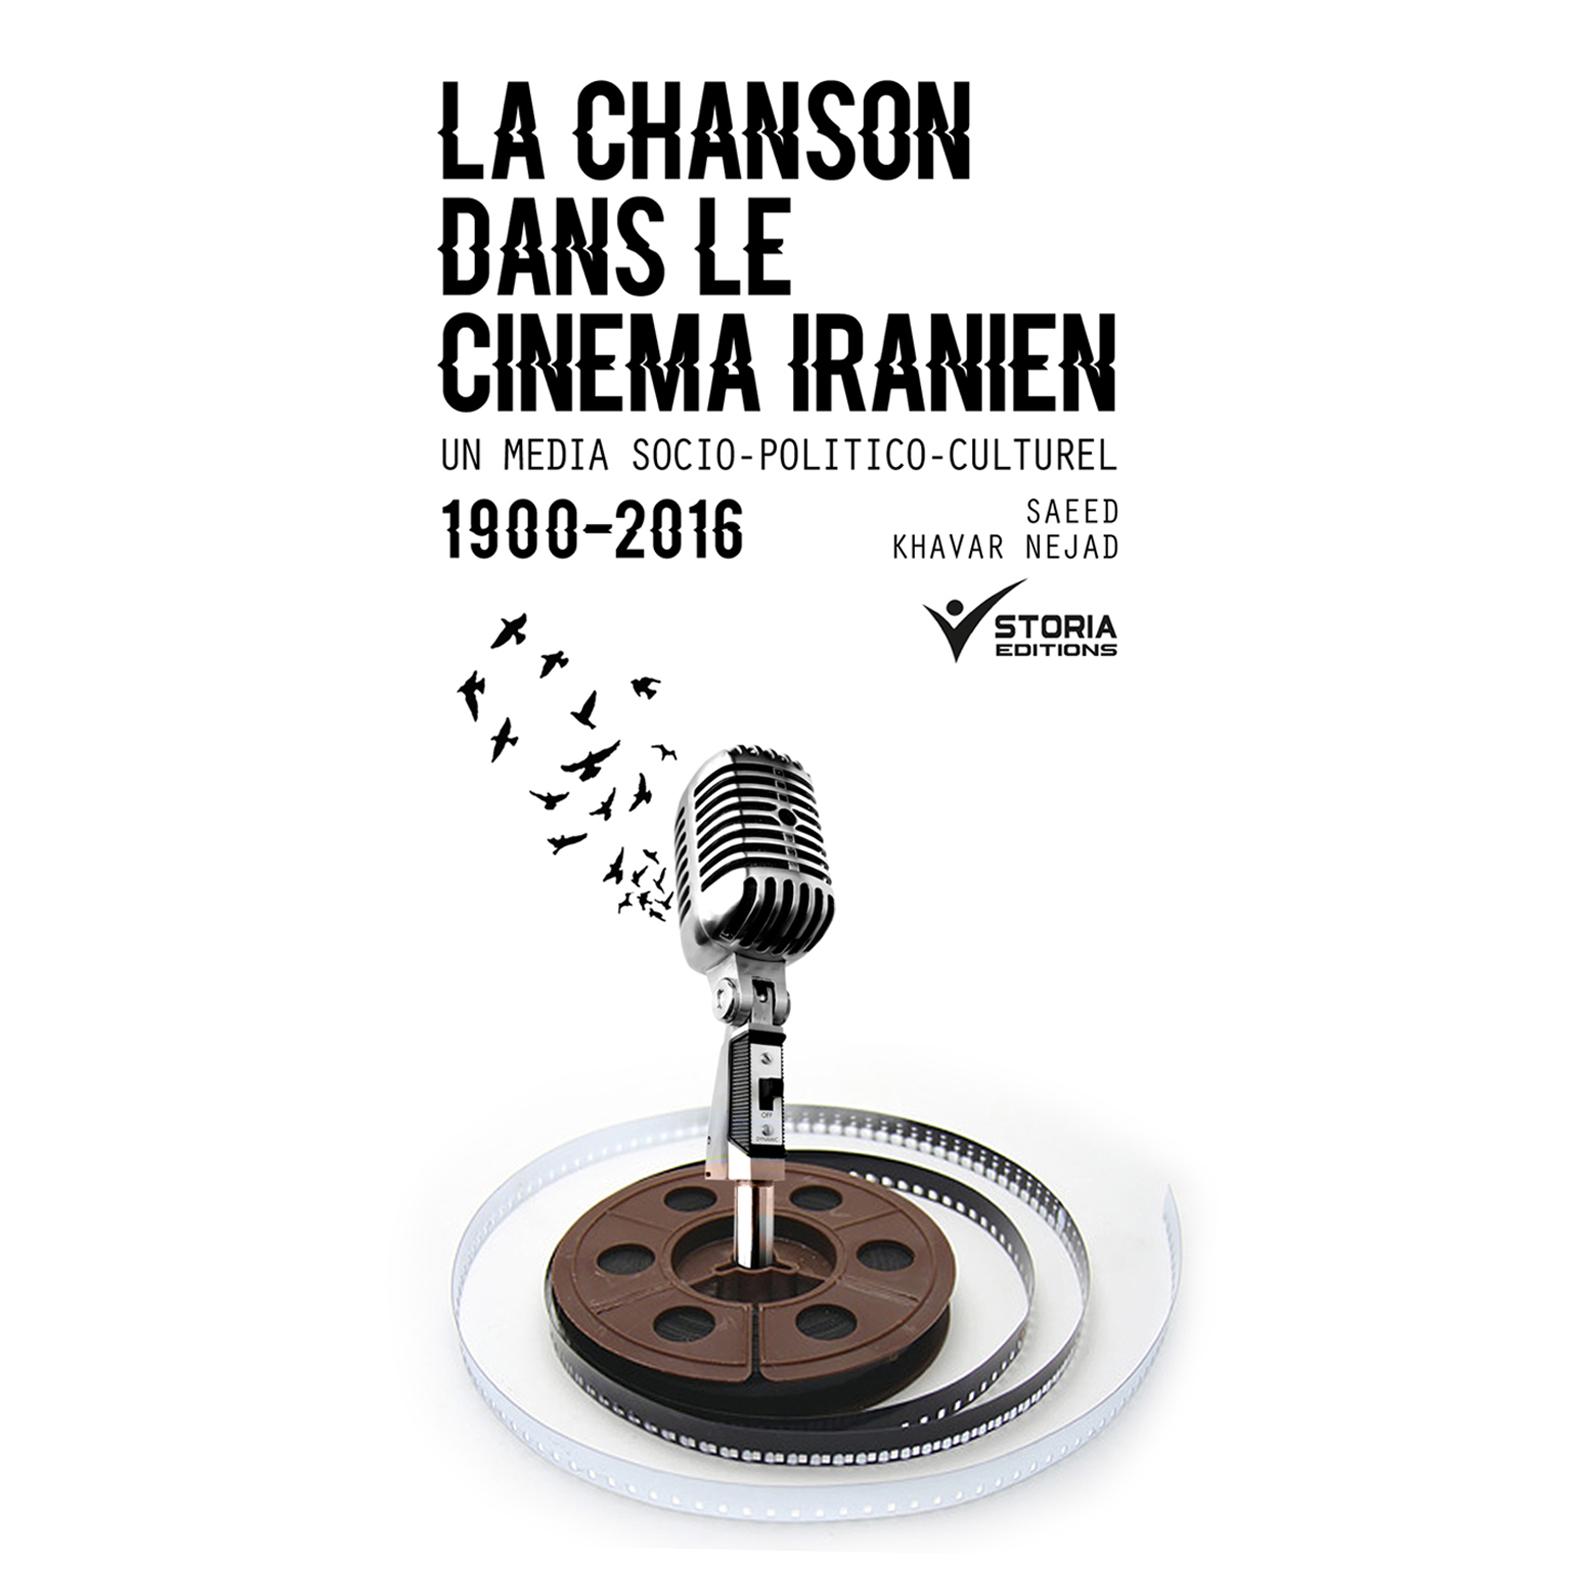 LA CHANSON DANS LE CINEMA IRANIEN